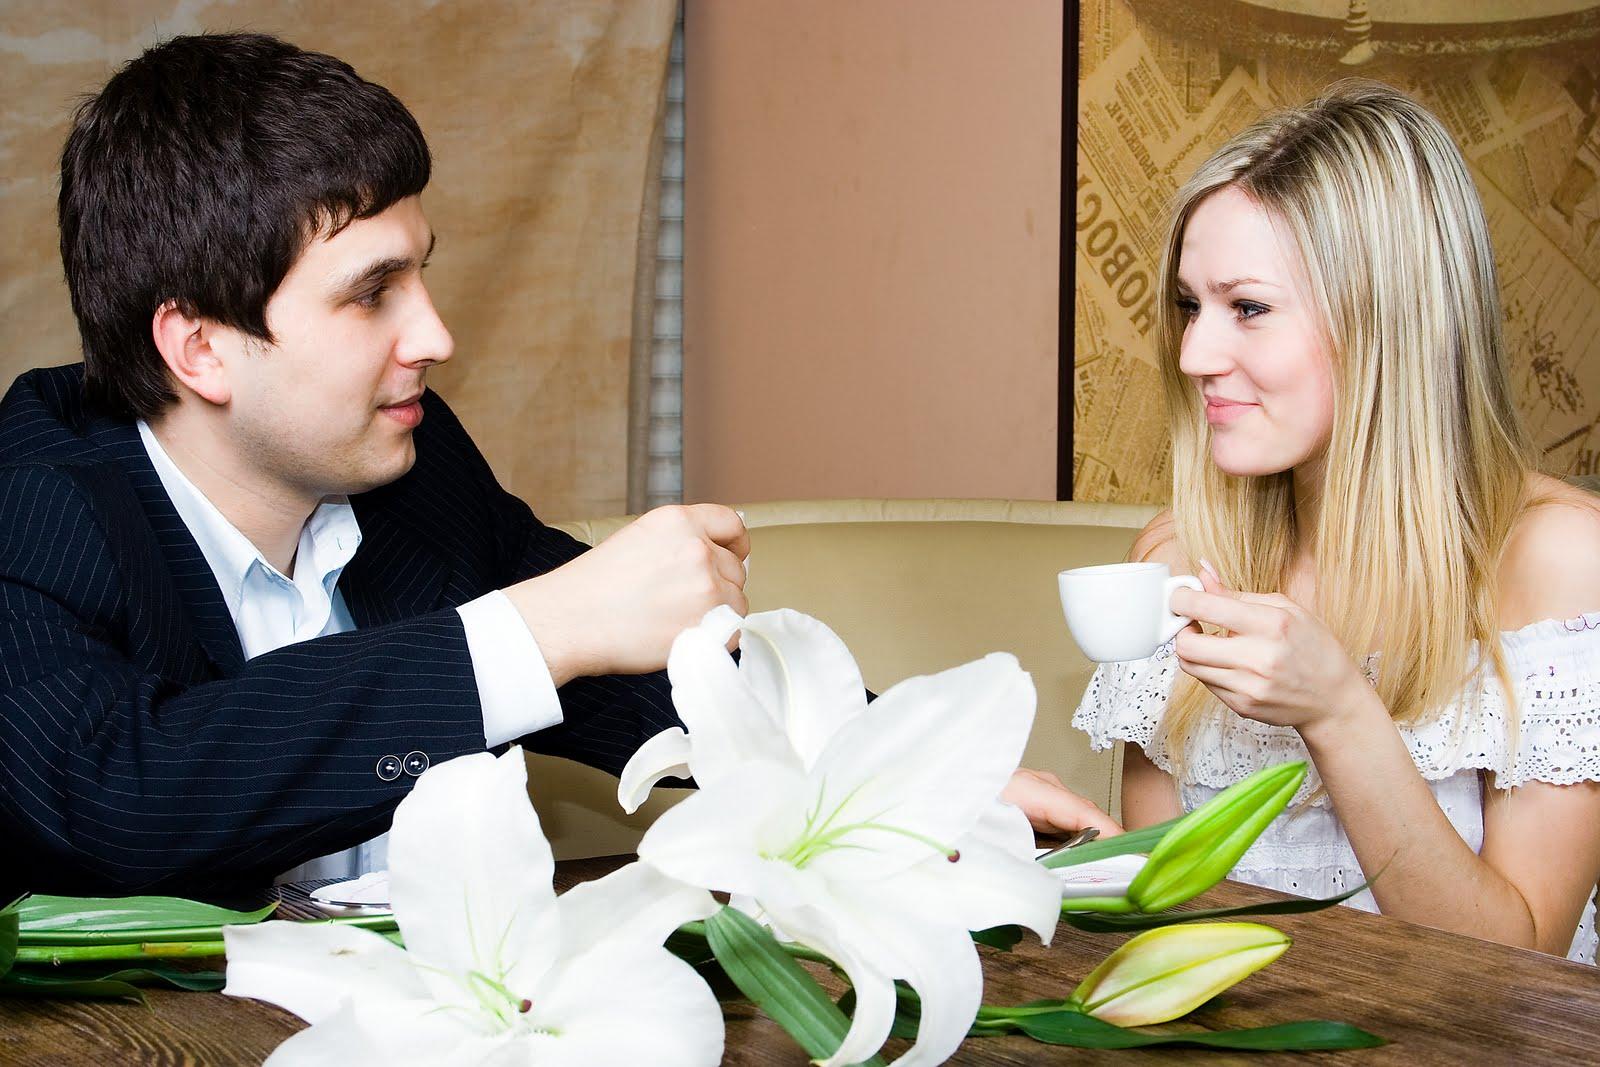 chicano dating